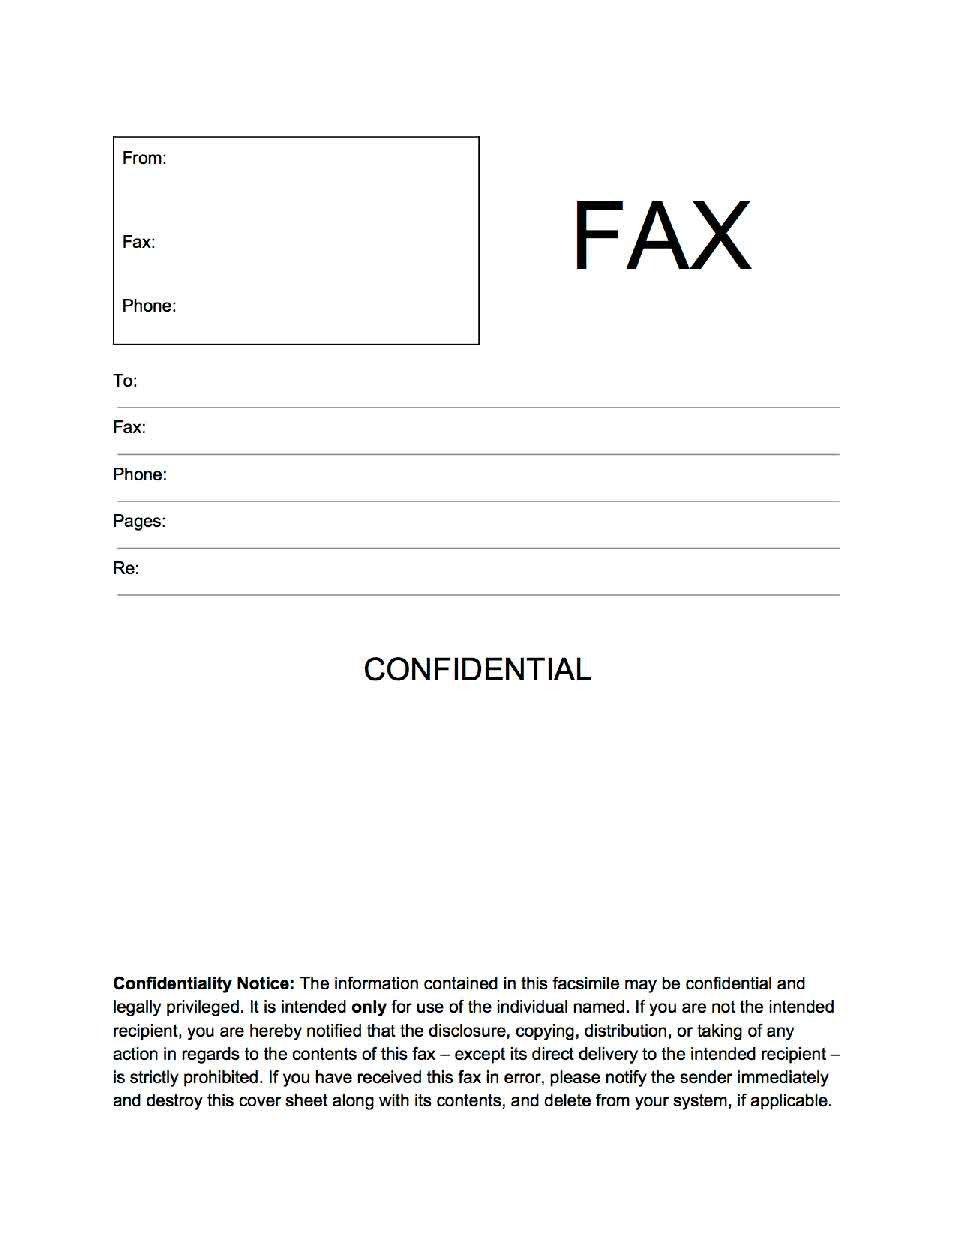 Printable Confidential Cover Sheet Fax Cover Sheet Confidential